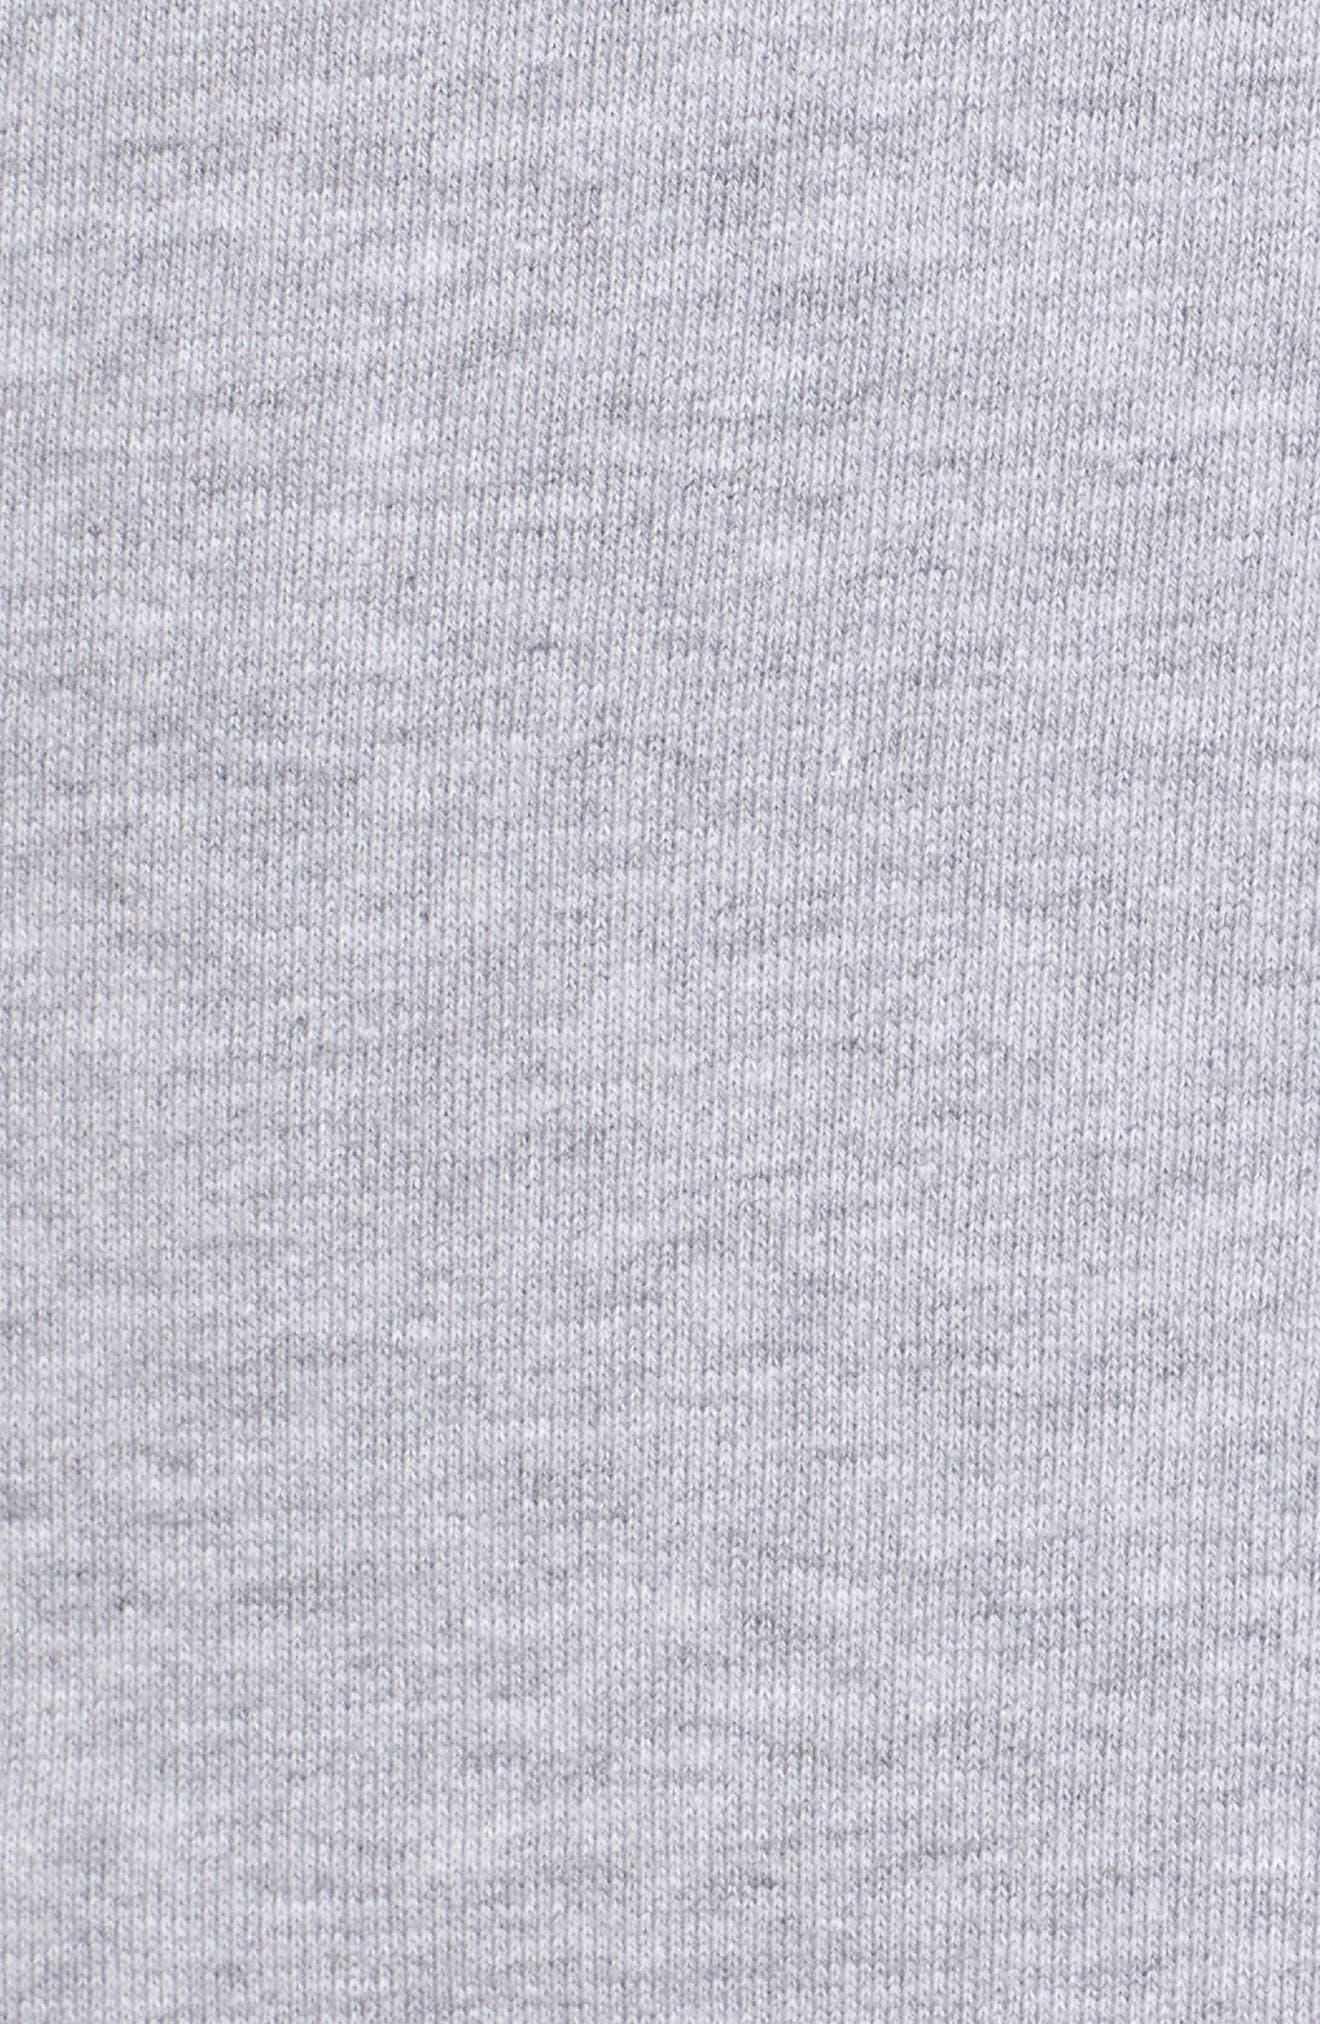 Wester Sweatshirt,                             Alternate thumbnail 5, color,                             Light Grey